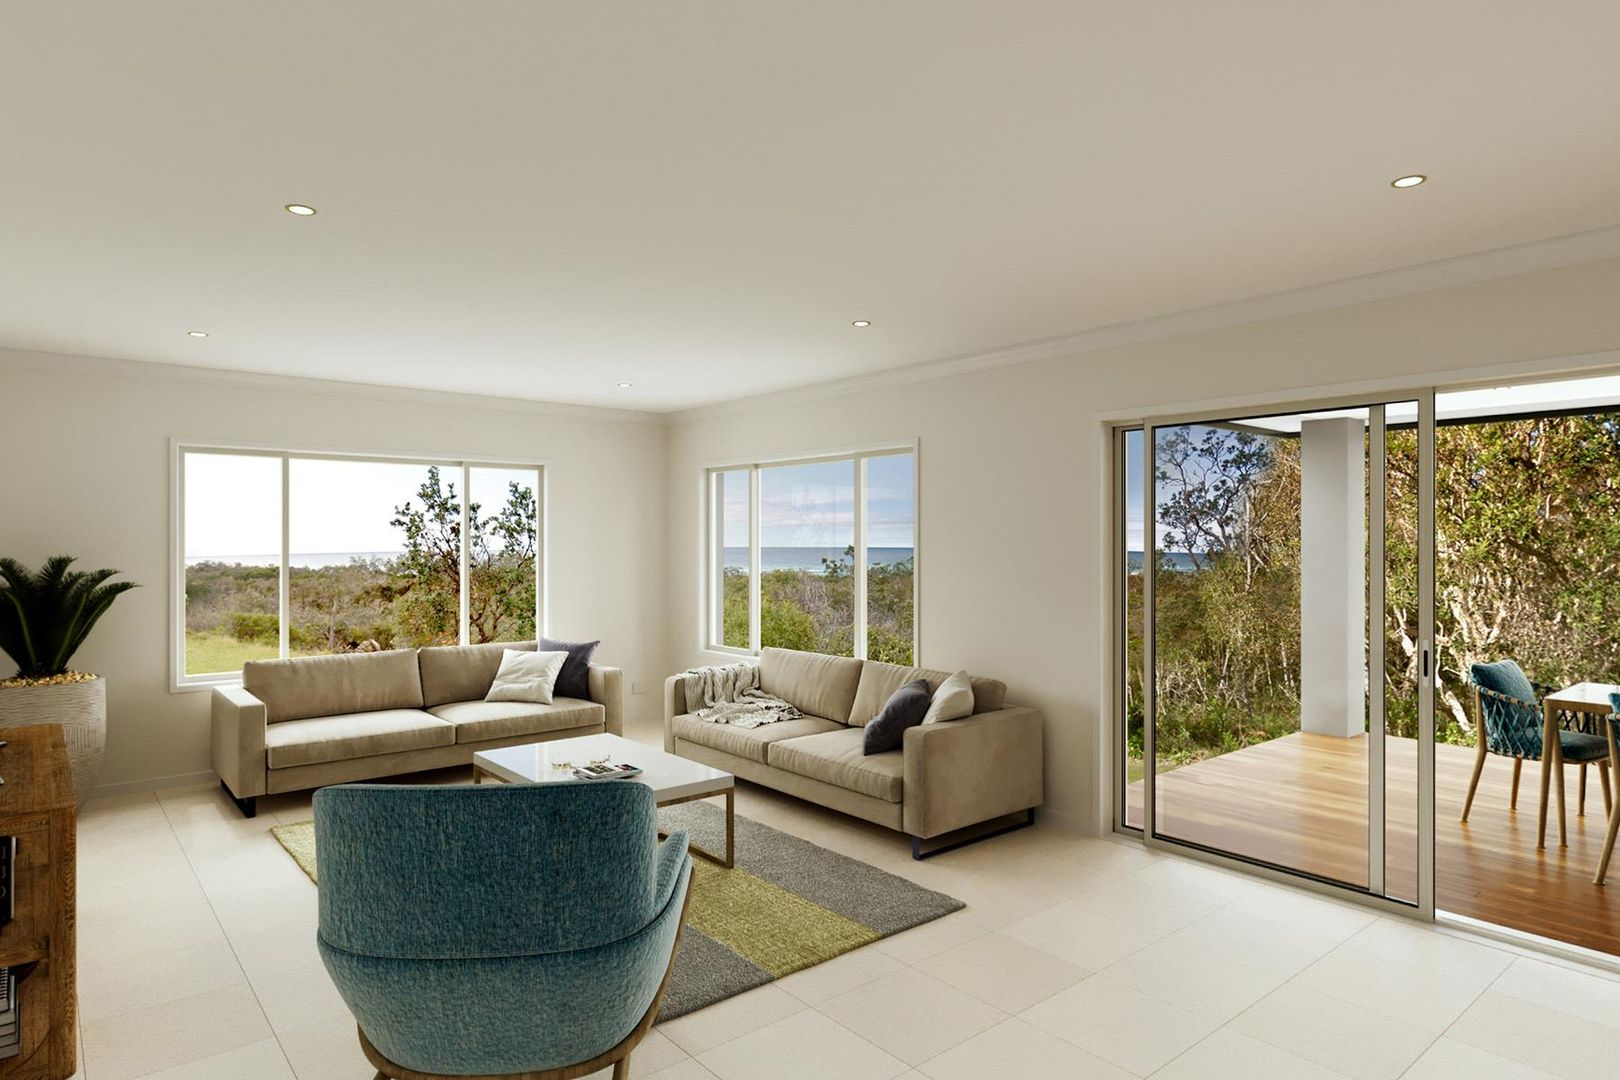 Lot 31 Harness Rd, Pinnacle Views, Kelso QLD 4815, Image 1